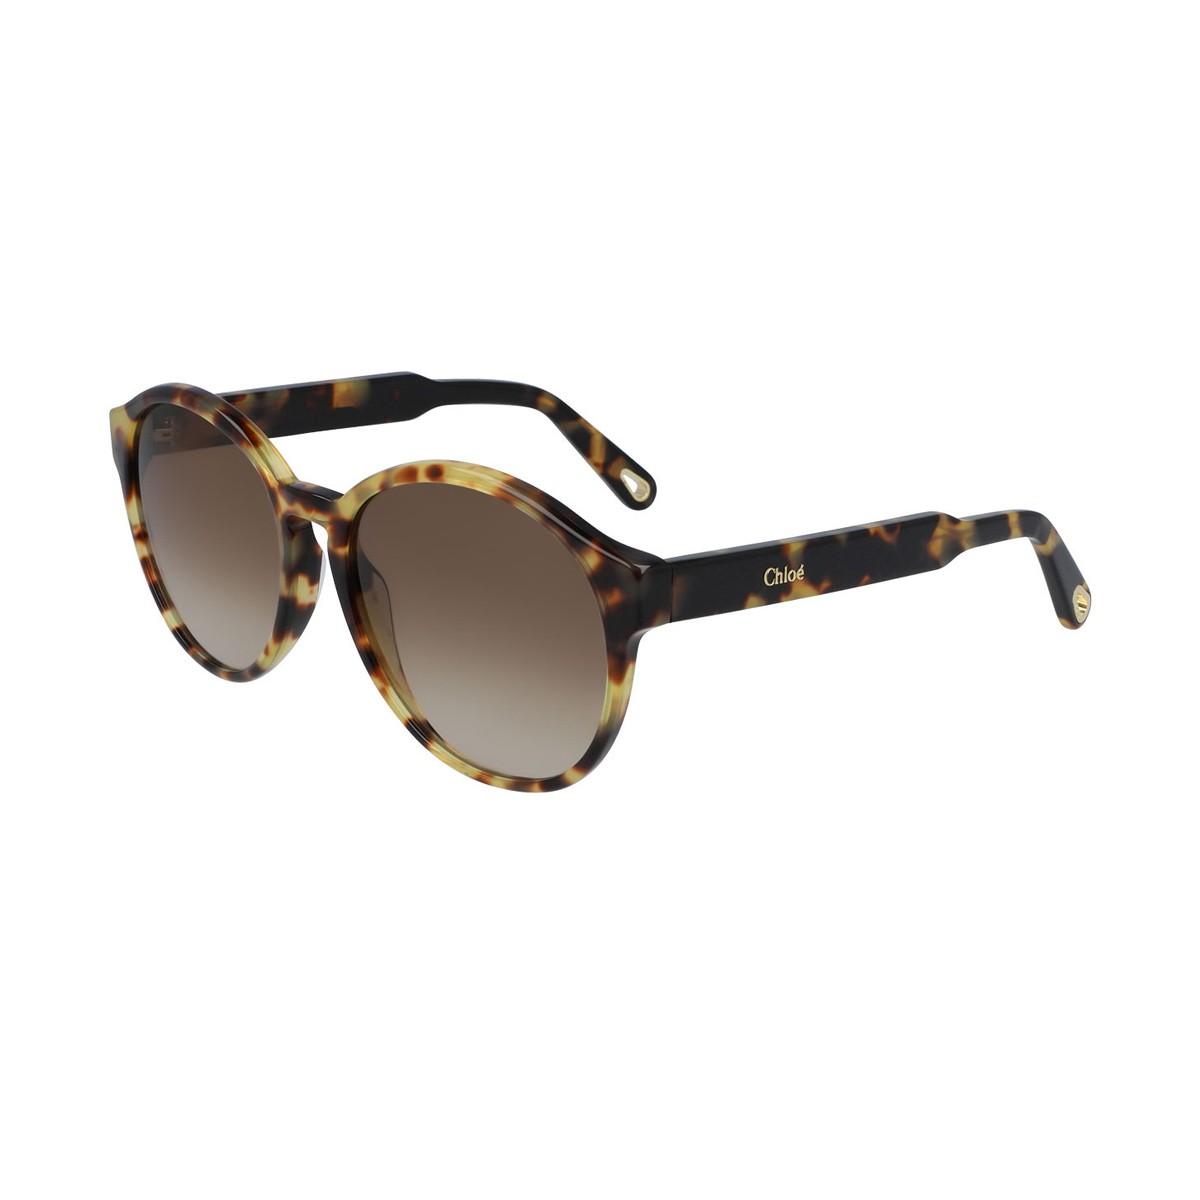 Chloé CE762S | Women's sunglasses